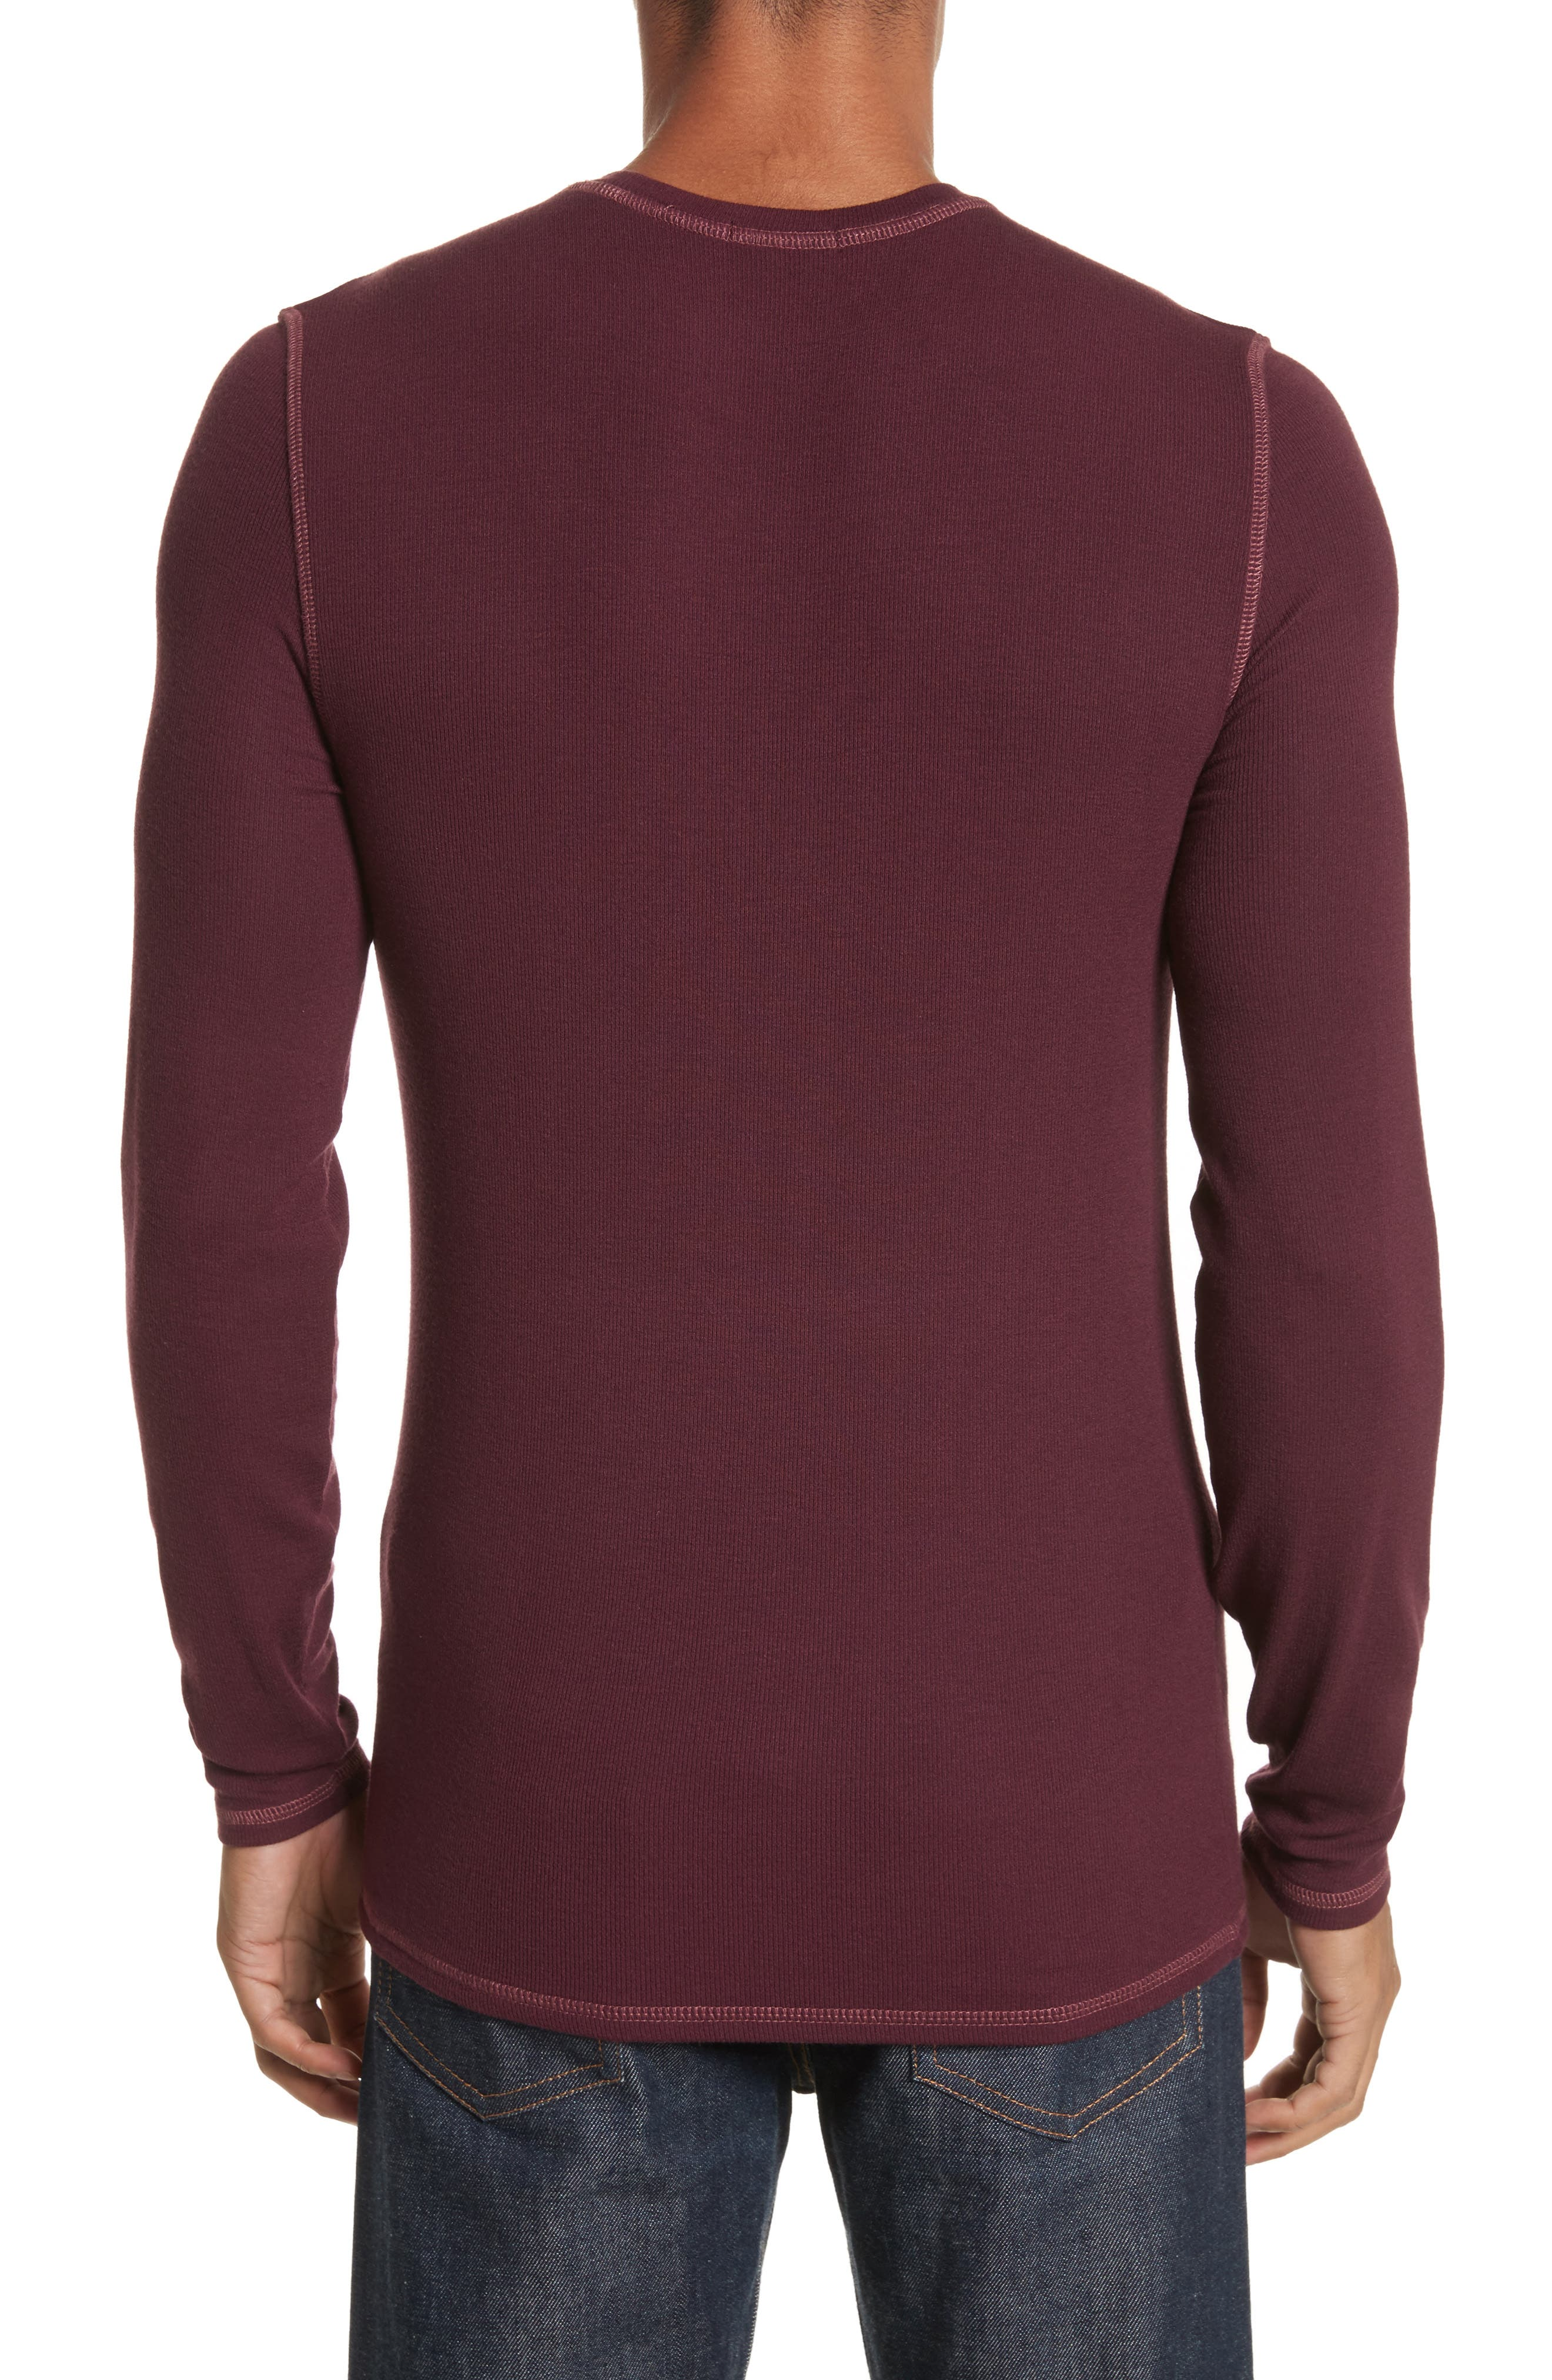 Rib Modal Crewneck Sweater,                             Alternate thumbnail 2, color,                             Merlot